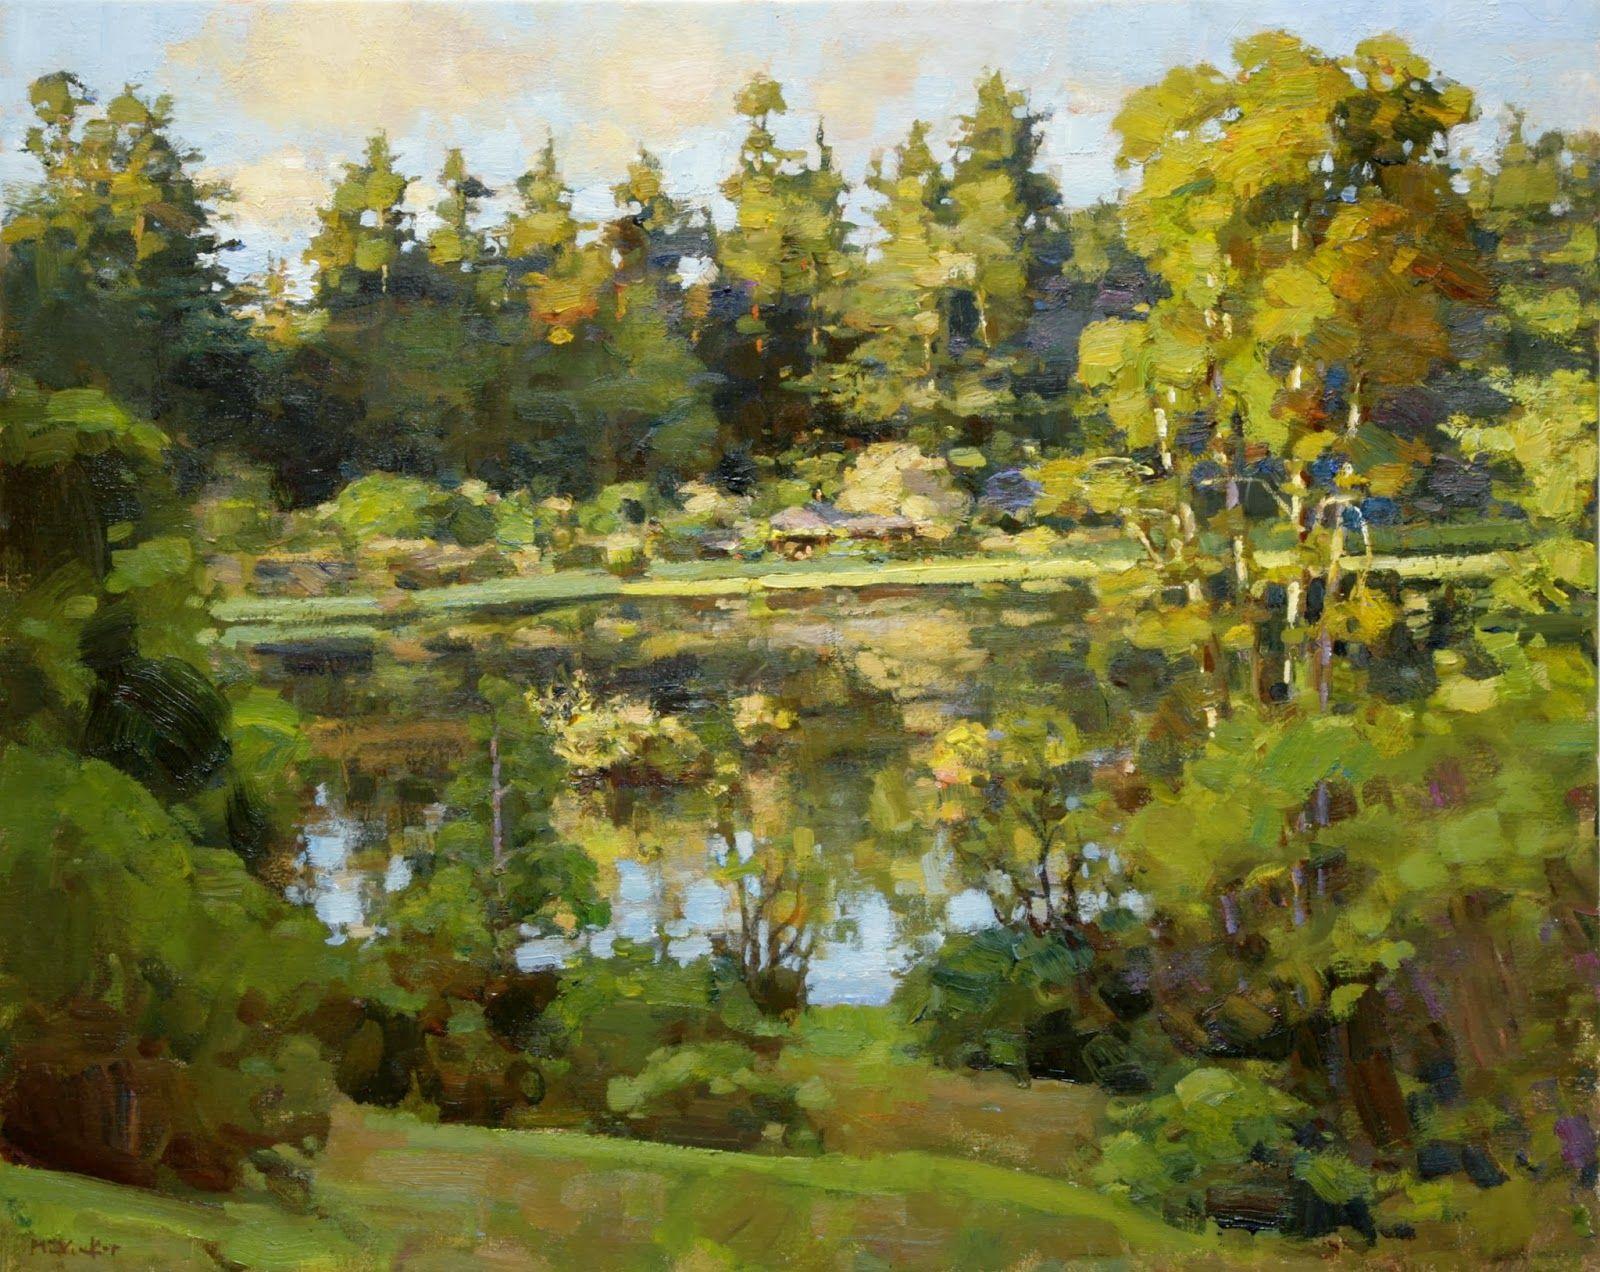 Jim McVicker Paintings: ' The Lake Paintings' | Jim ...